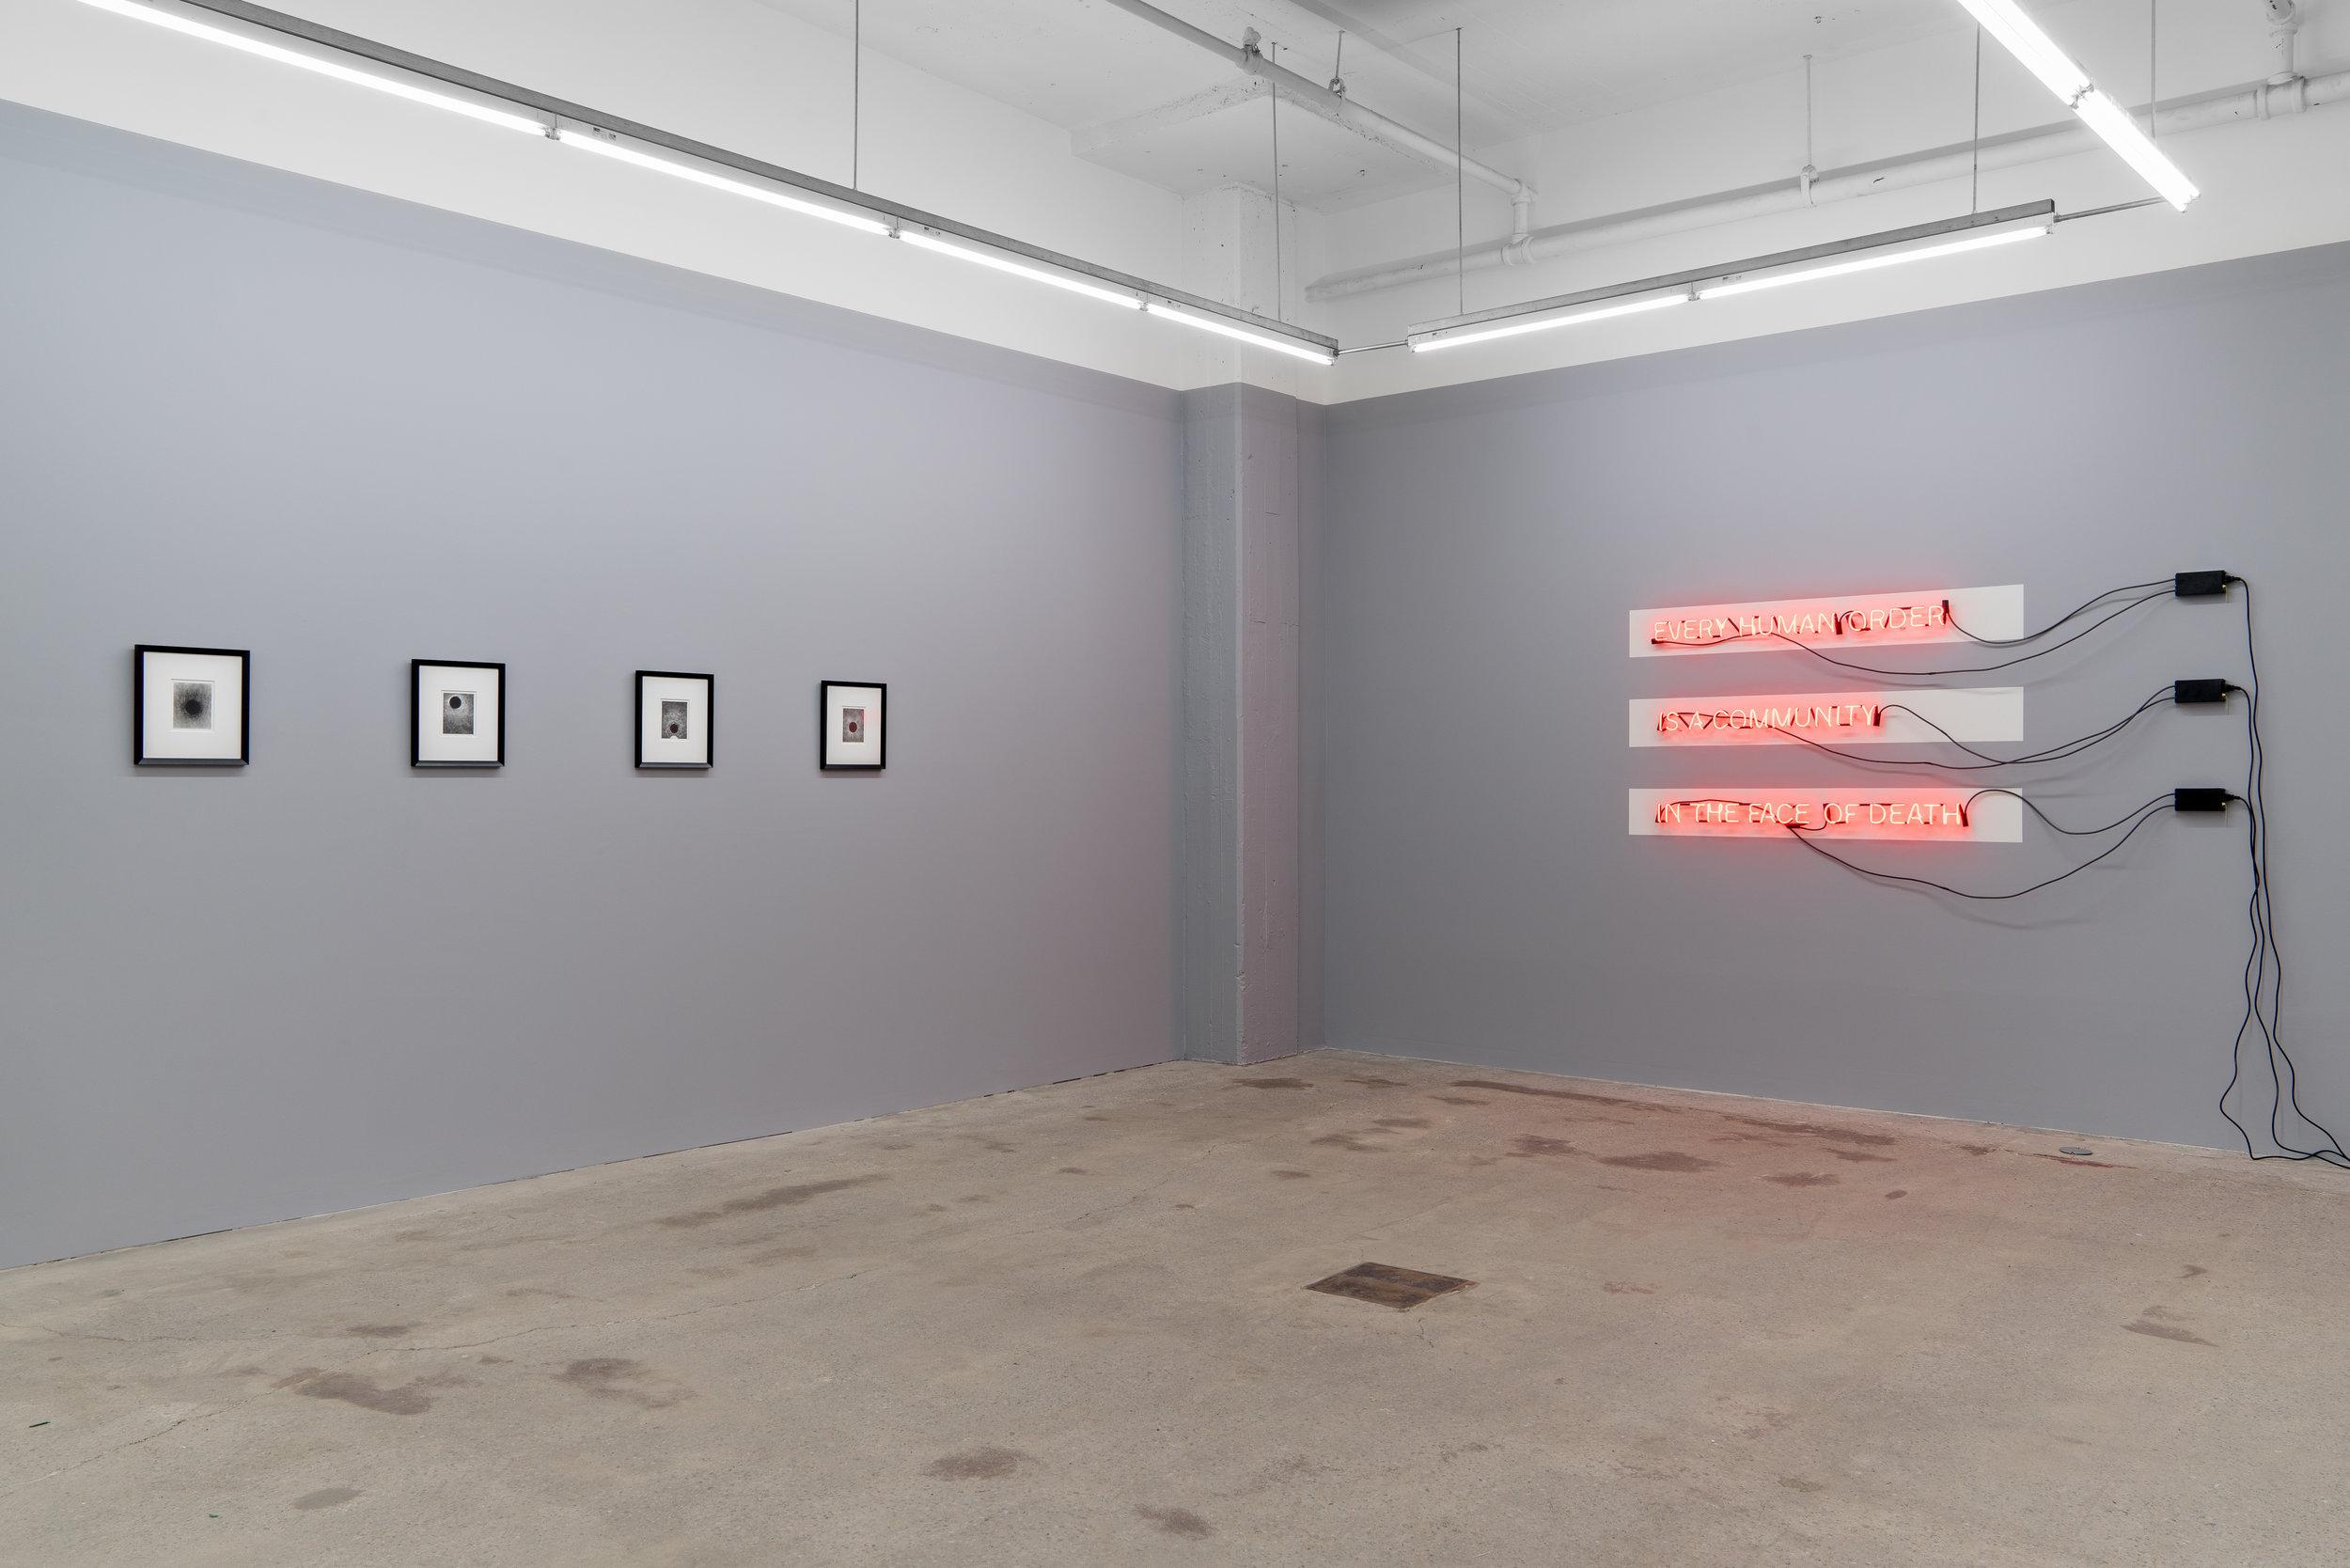 Das Gleitende - 2 , 2018, exhibition view, Galerie Nicolas Robert, photo : Jean-Michael Seminaro